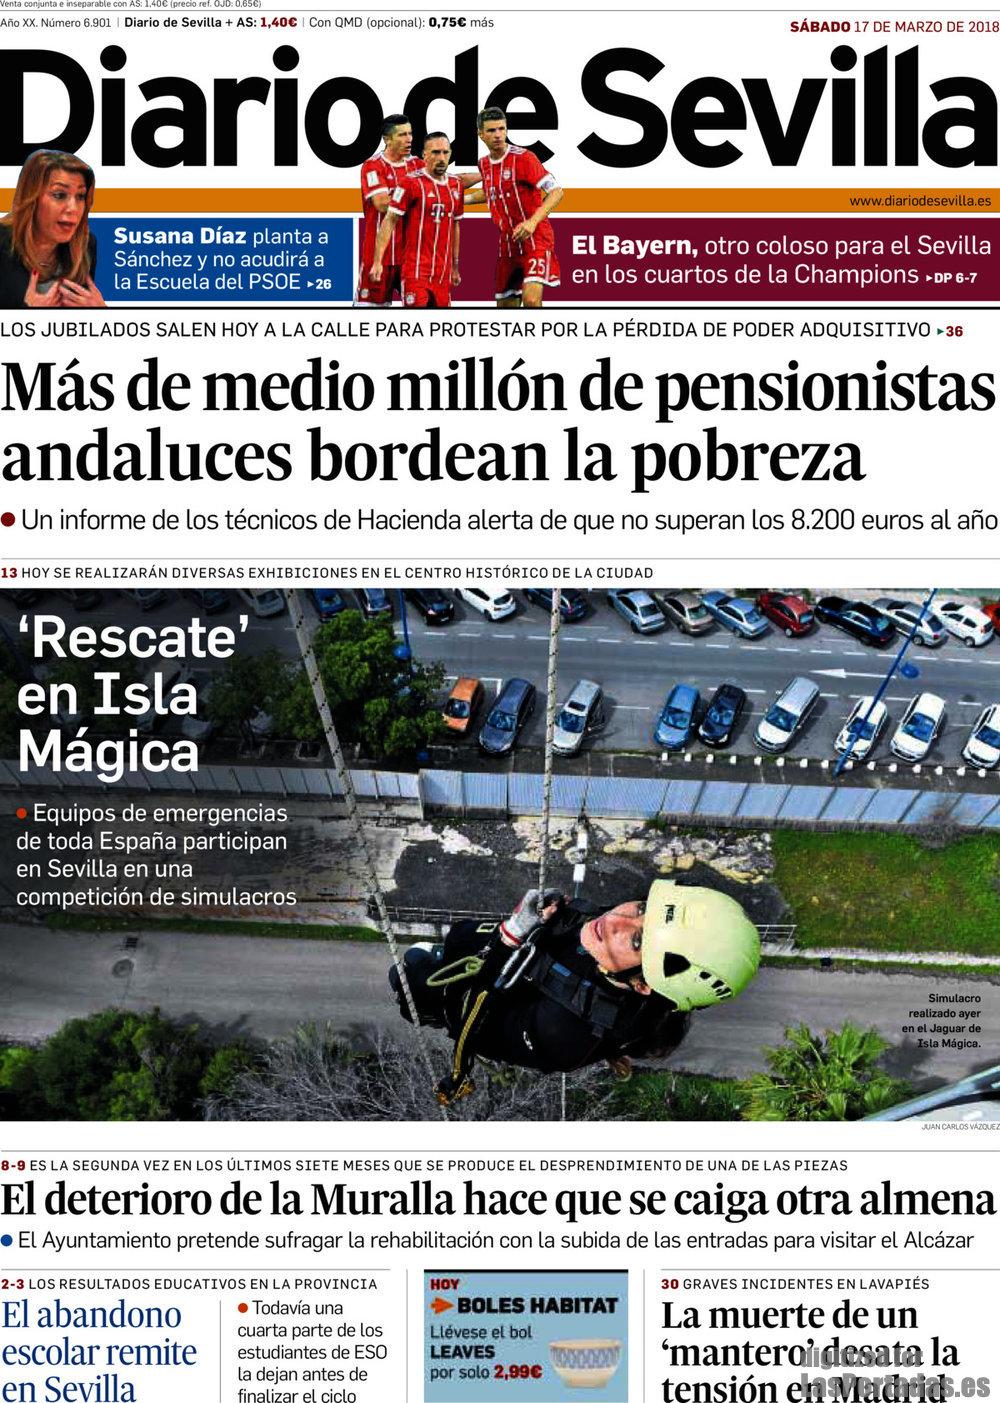 Periodico Diario de Sevilla - 17/3/2018